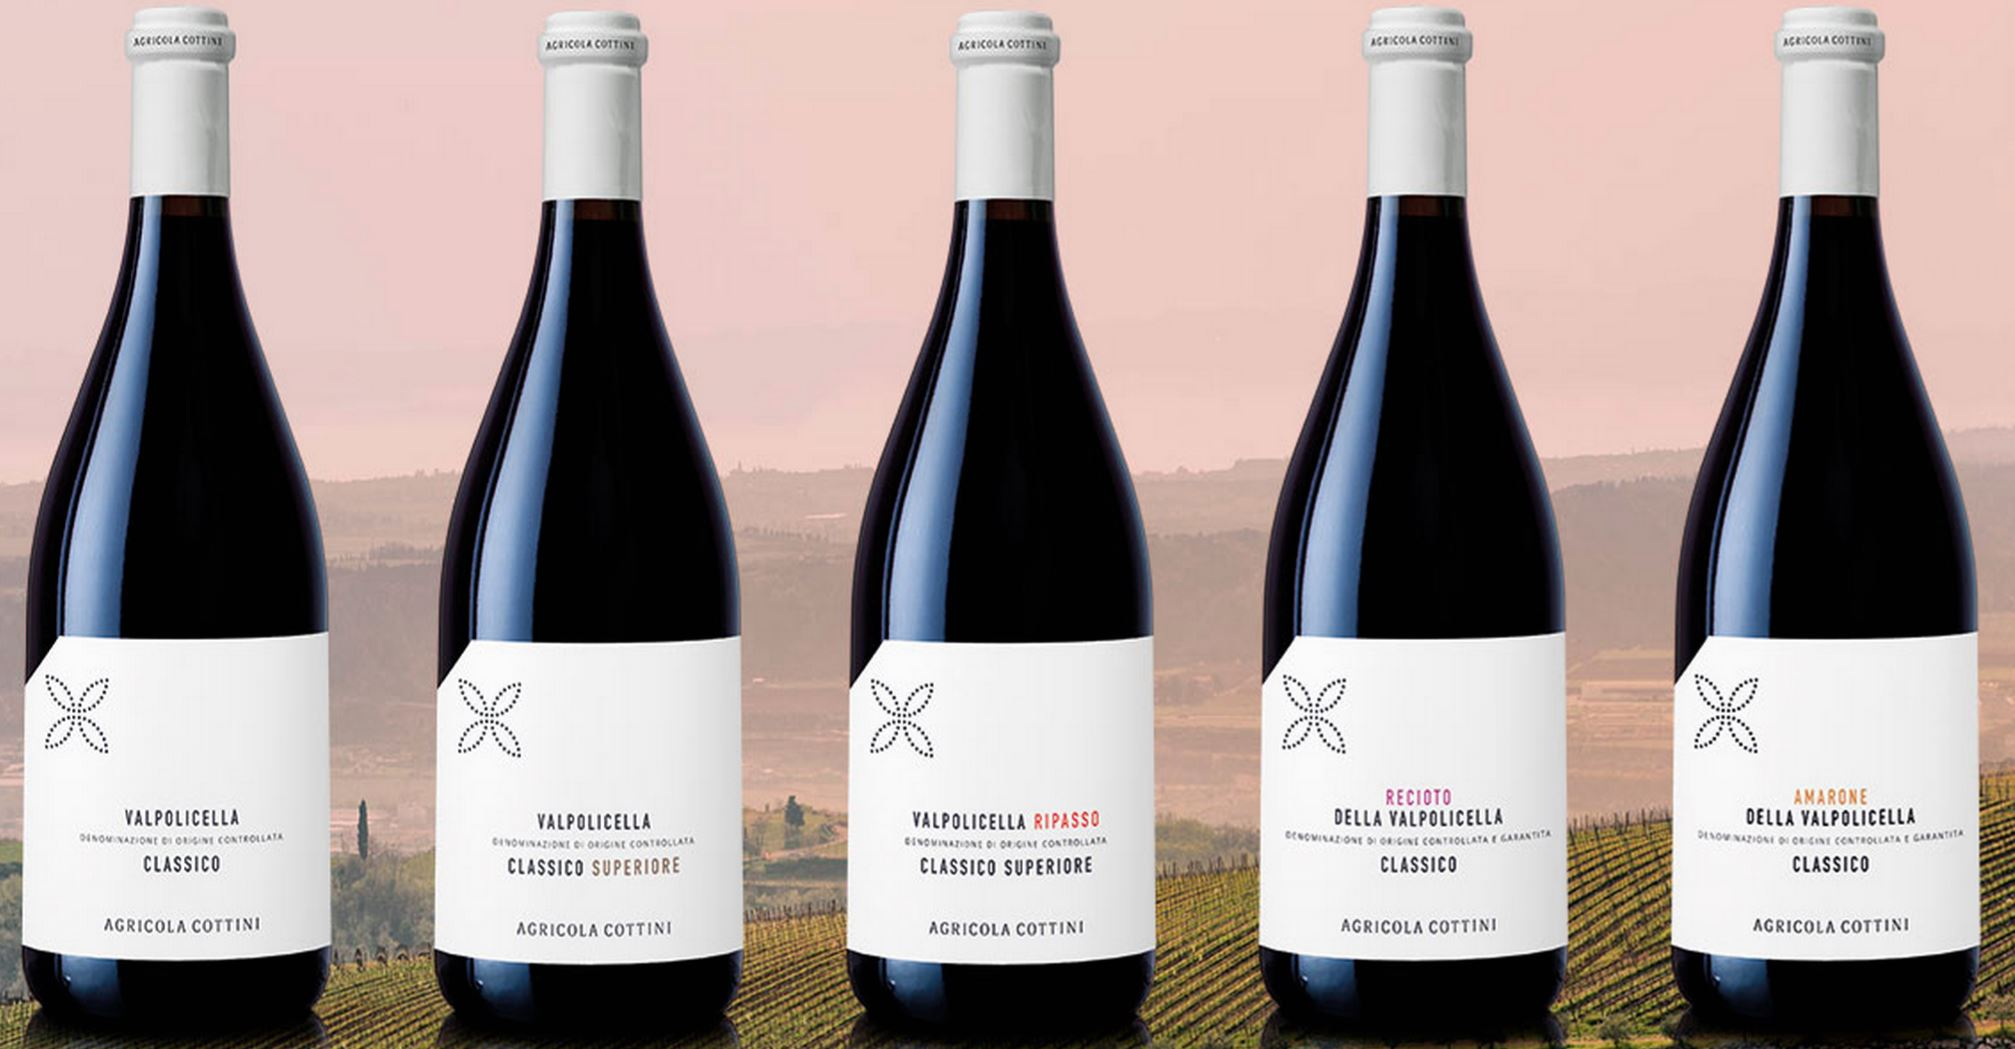 Wijnen Agricola Cottini